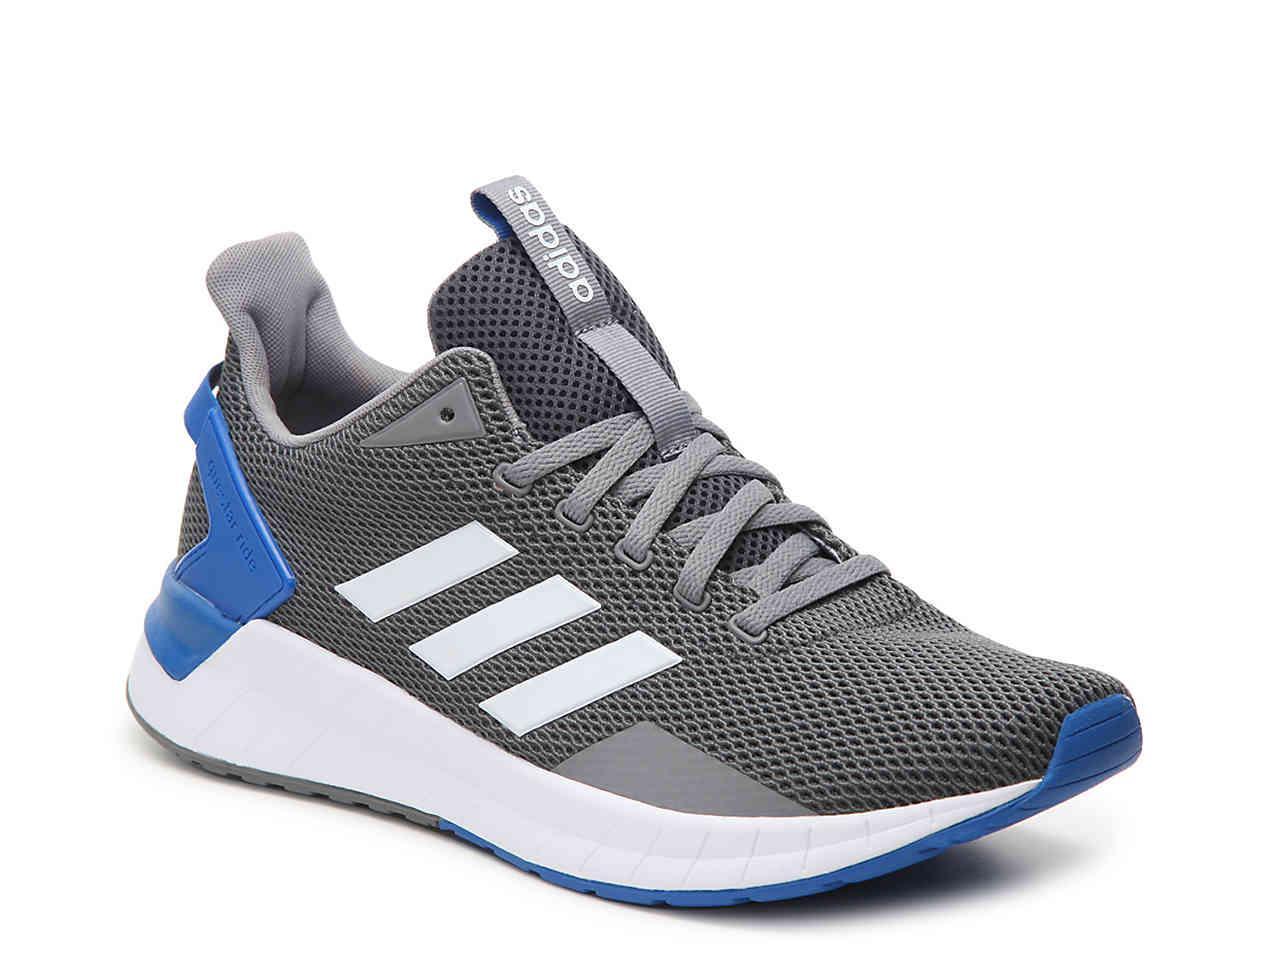 adidas Questar Ride Running Shoe in